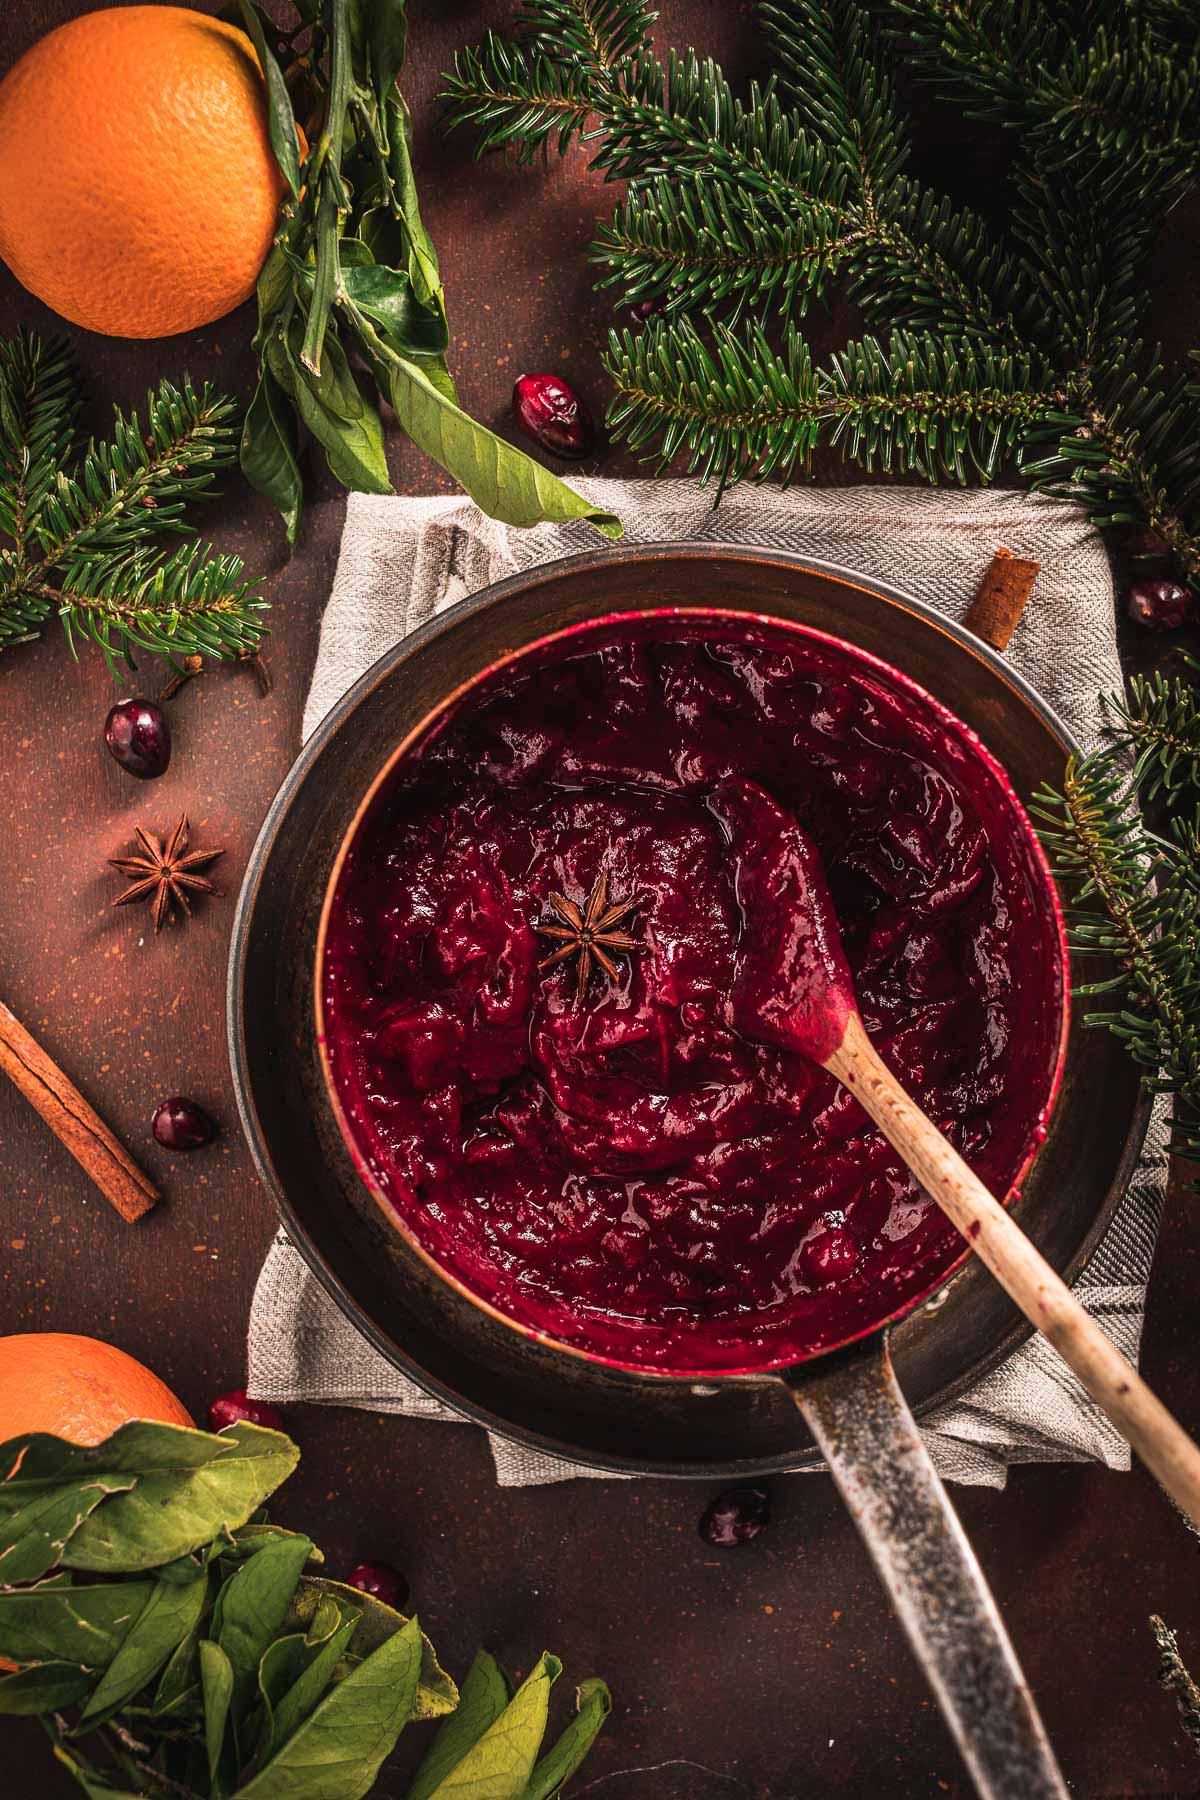 Maple Cranberry Sauce recipe naturally sweetened with maple syrup ricetta salsa di mirtilli rossi senza zucchero vegan Natale Thanksgiving